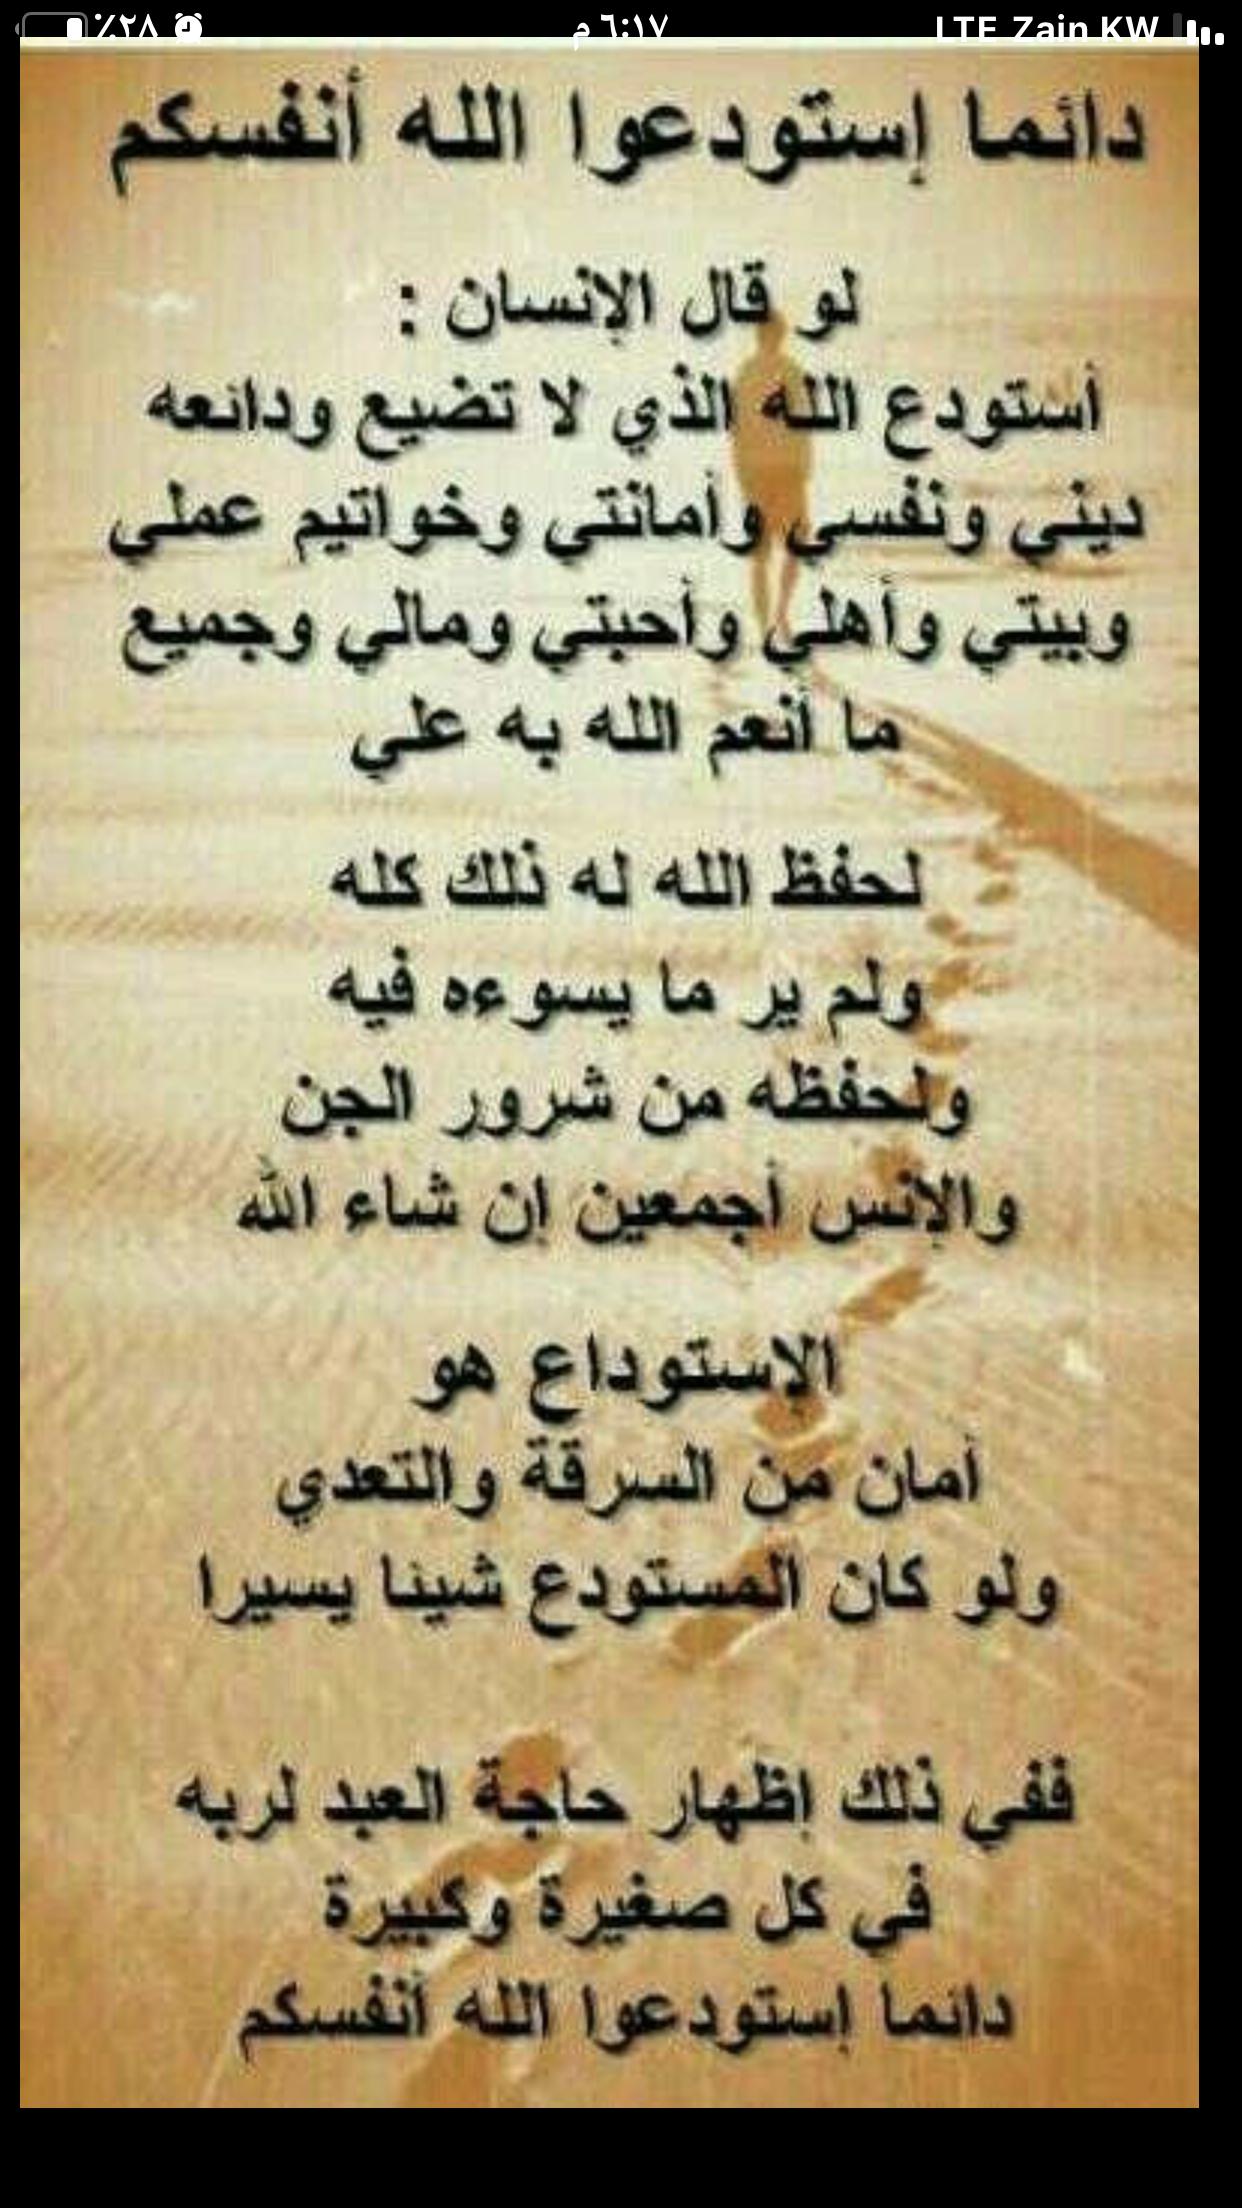 Pin By Tsouria Zennaki On اذكارات Quran Verses Words Islamic Quotes